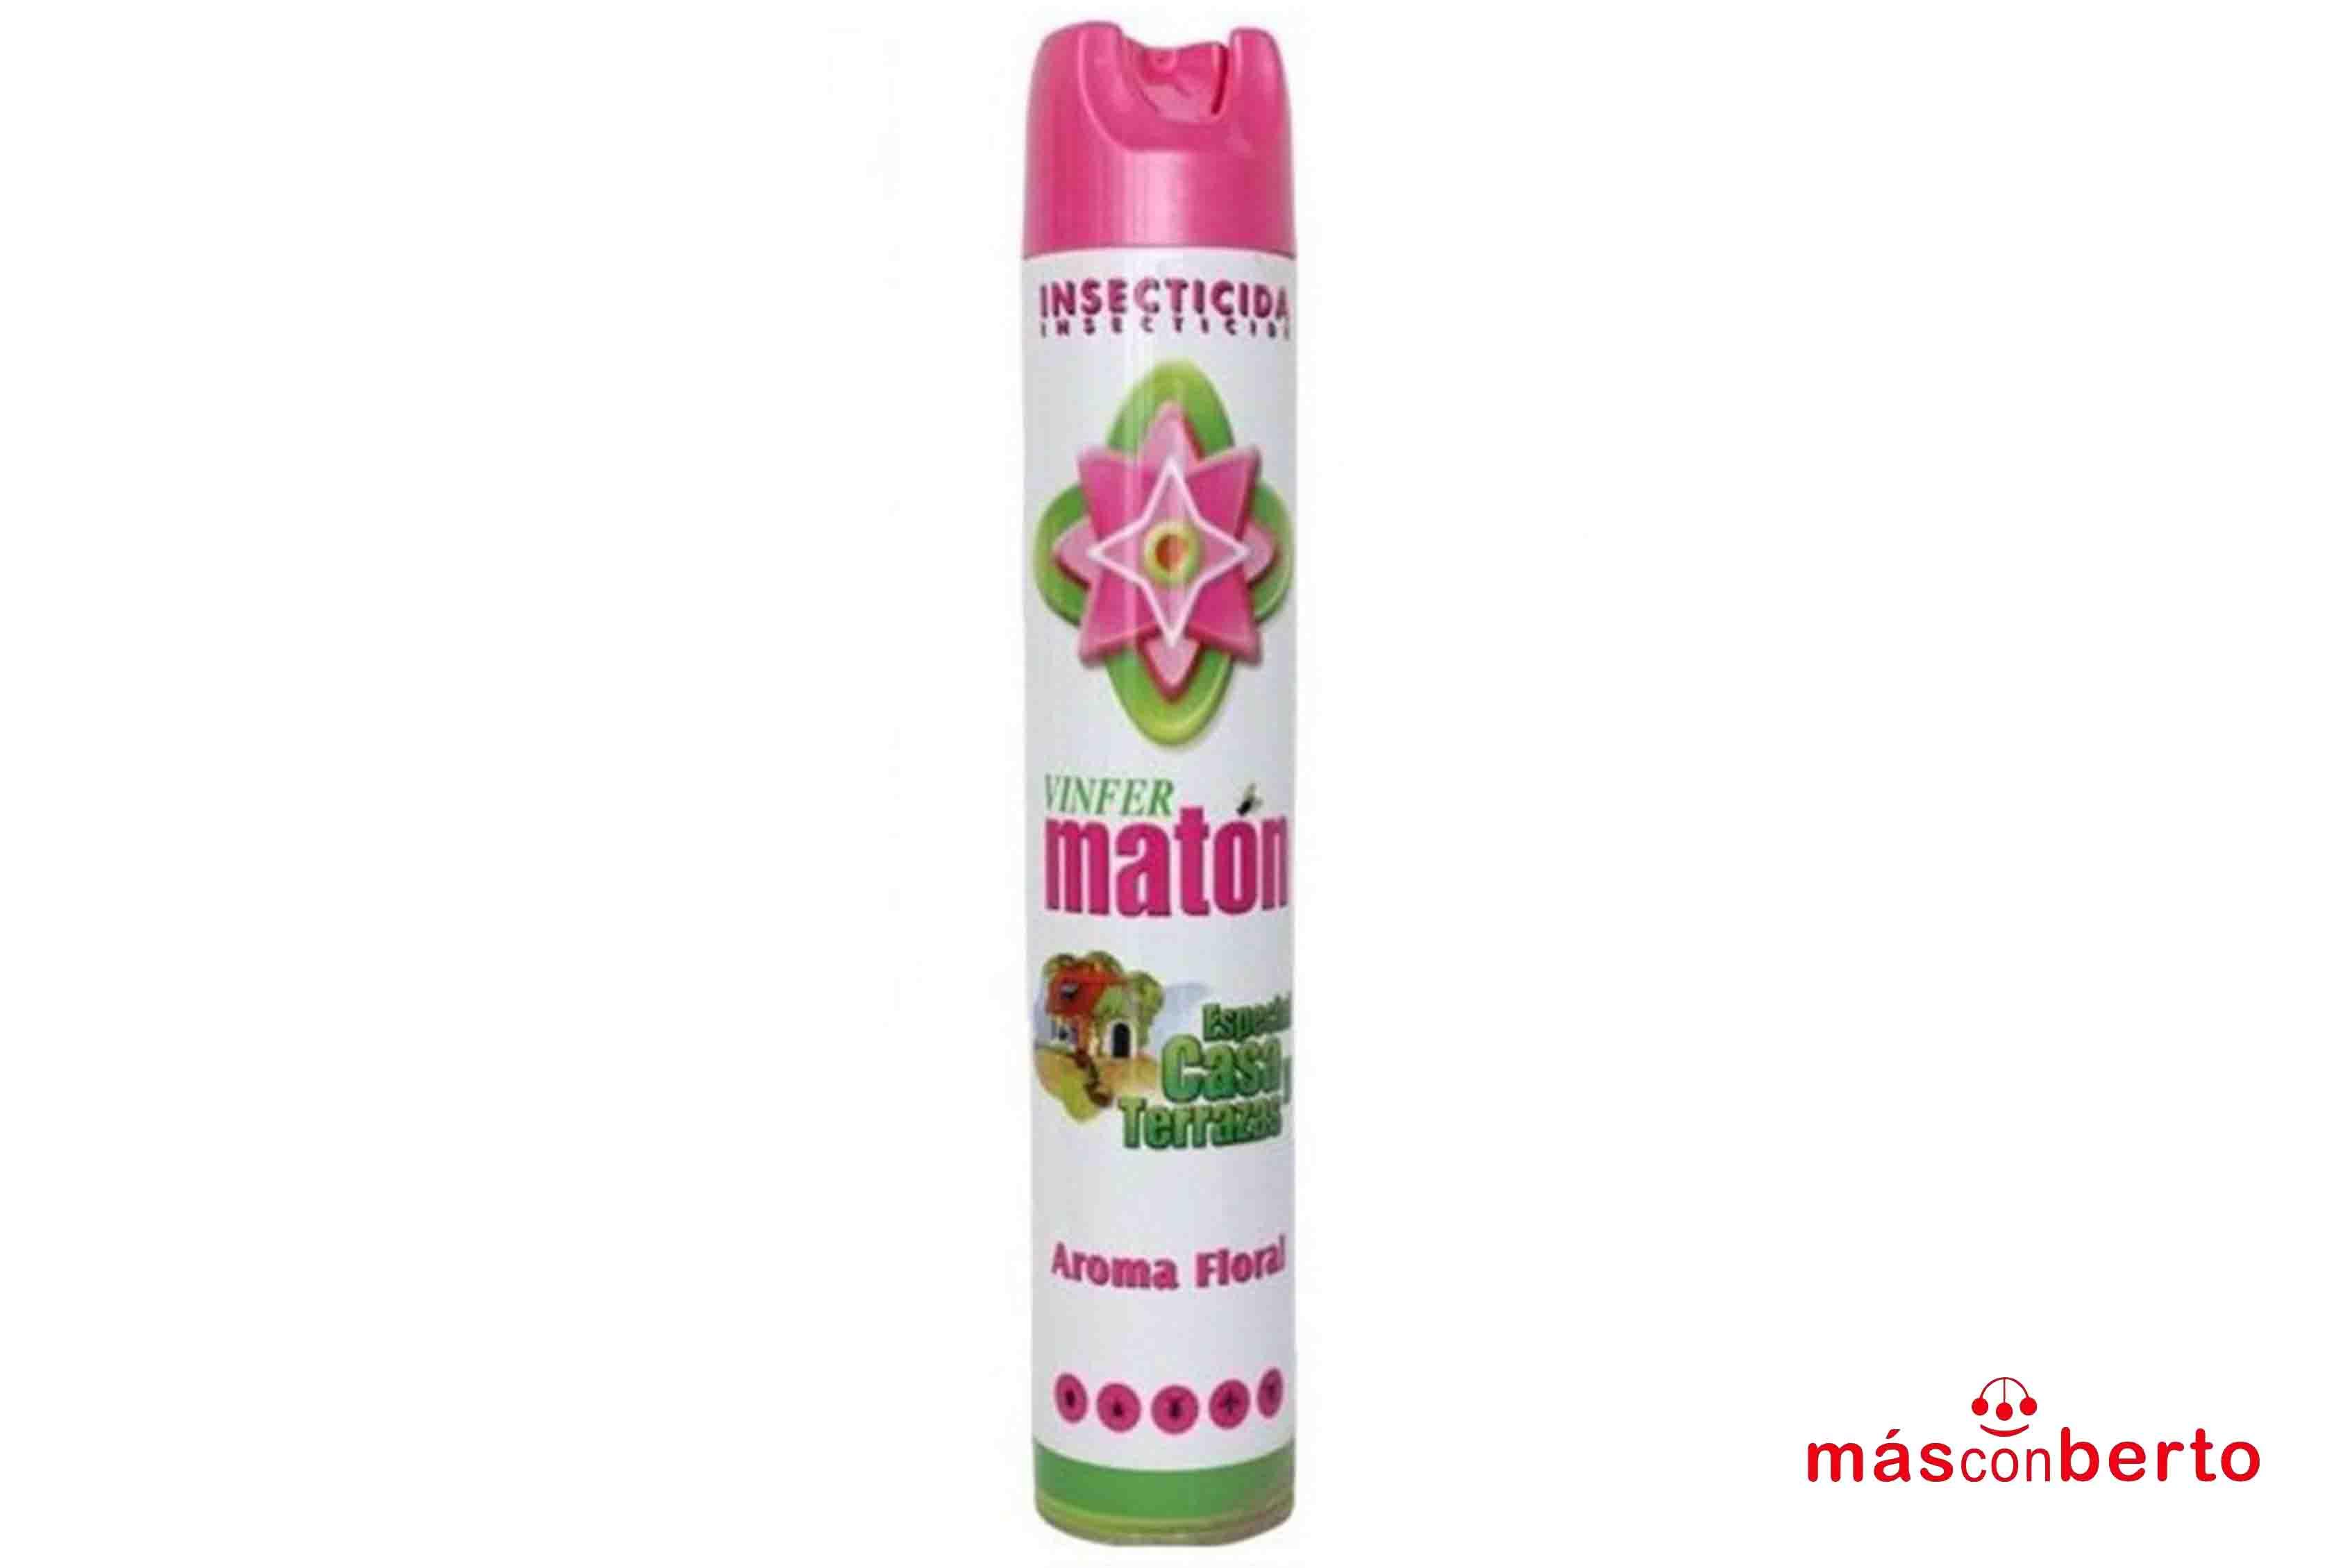 Insecticida Vinfer Matón...